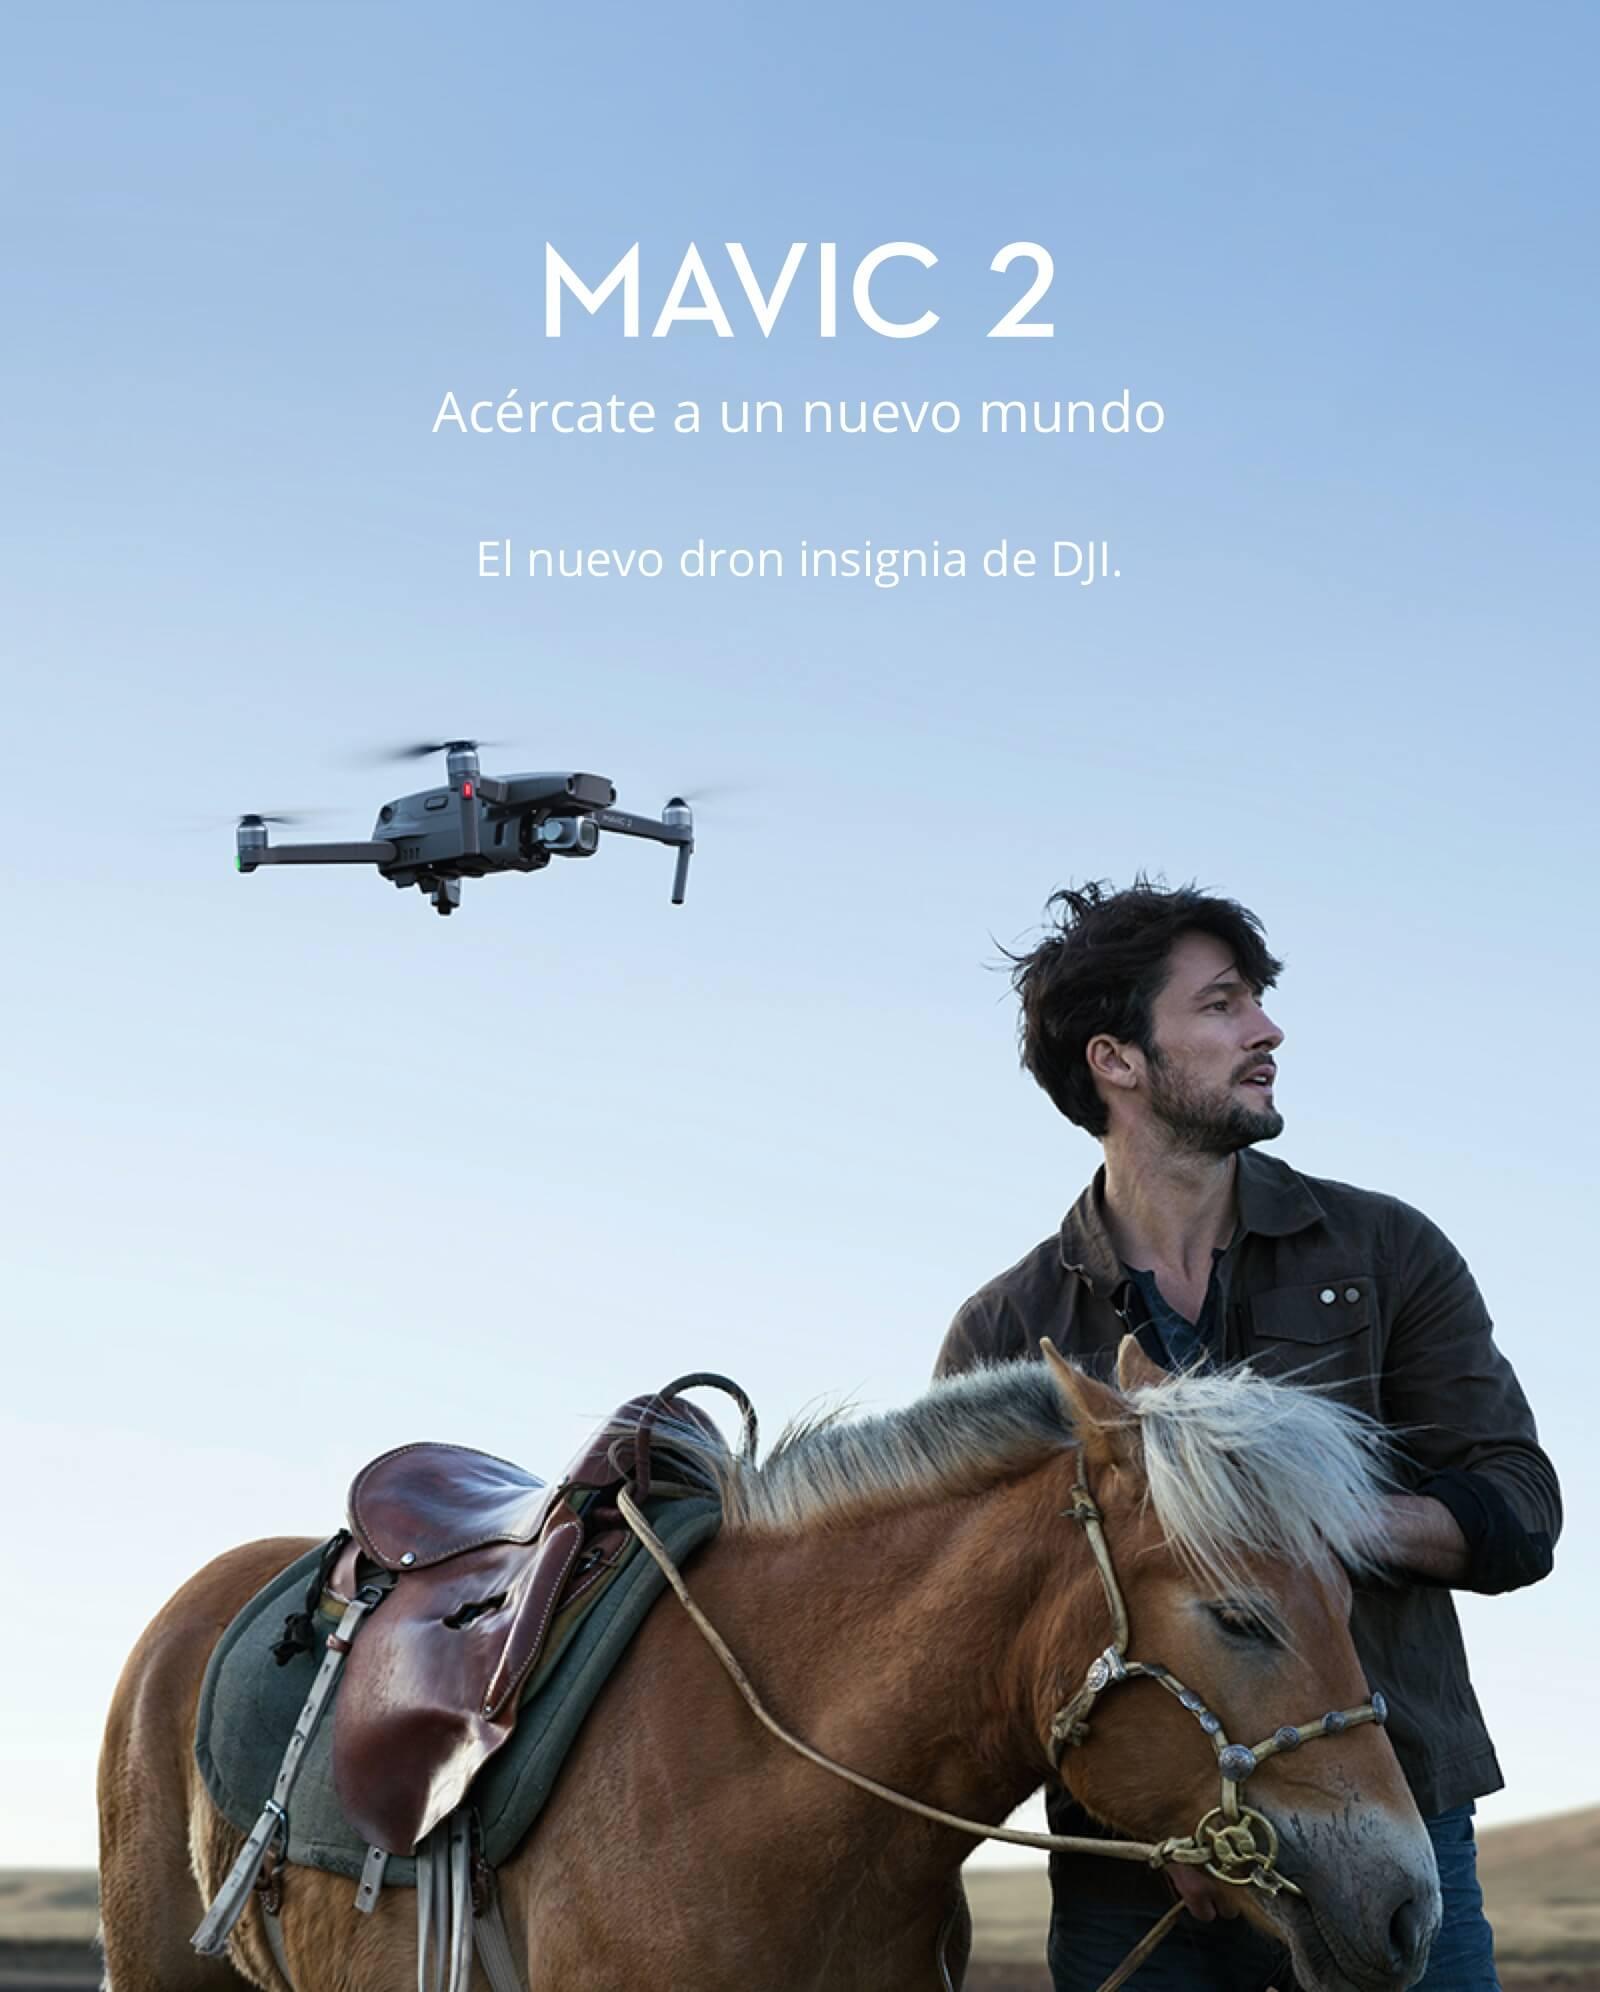 Mavic_2_pro_a.jpg